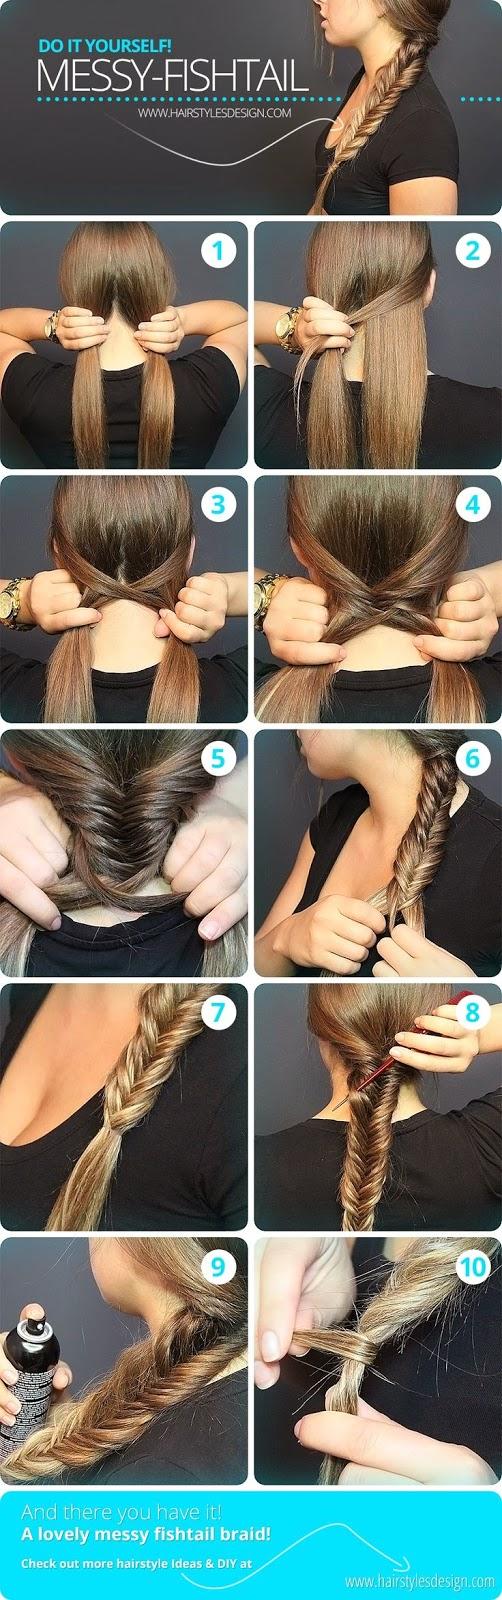 Messay Fishtail Hair Style Diy..